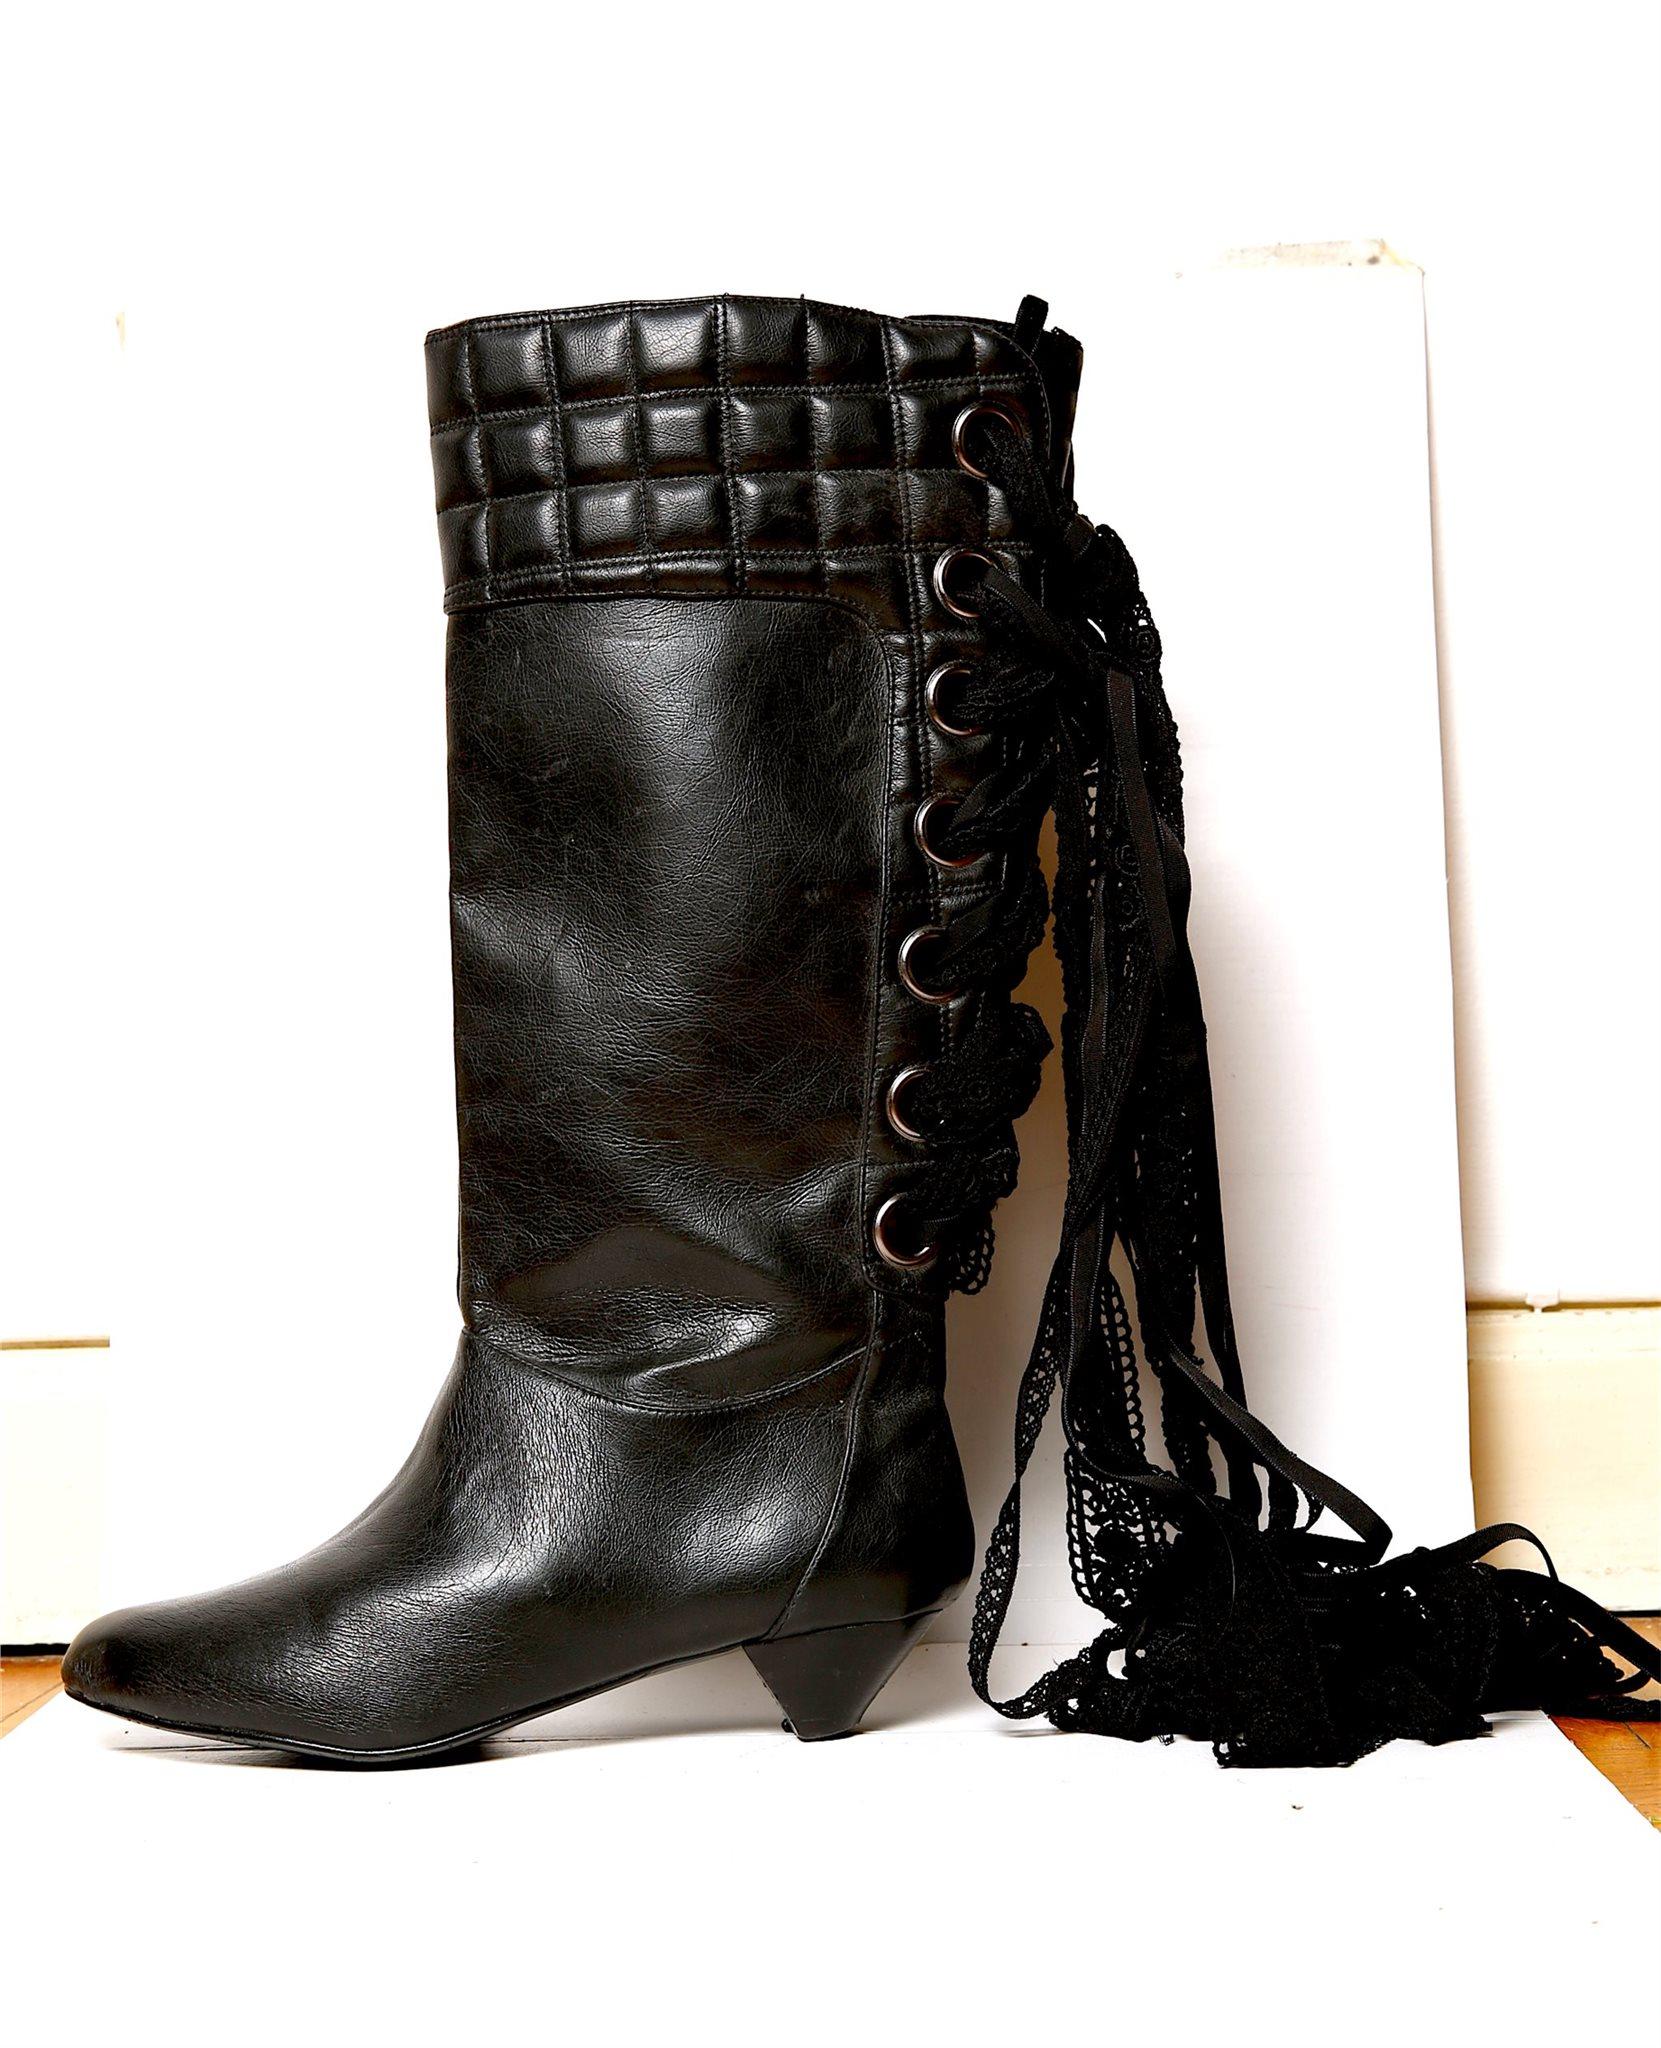 Stövlar   skor   boots   klack   svart   spets.. (343028159) ᐈ Köp ... 8b03ecfacaa7a